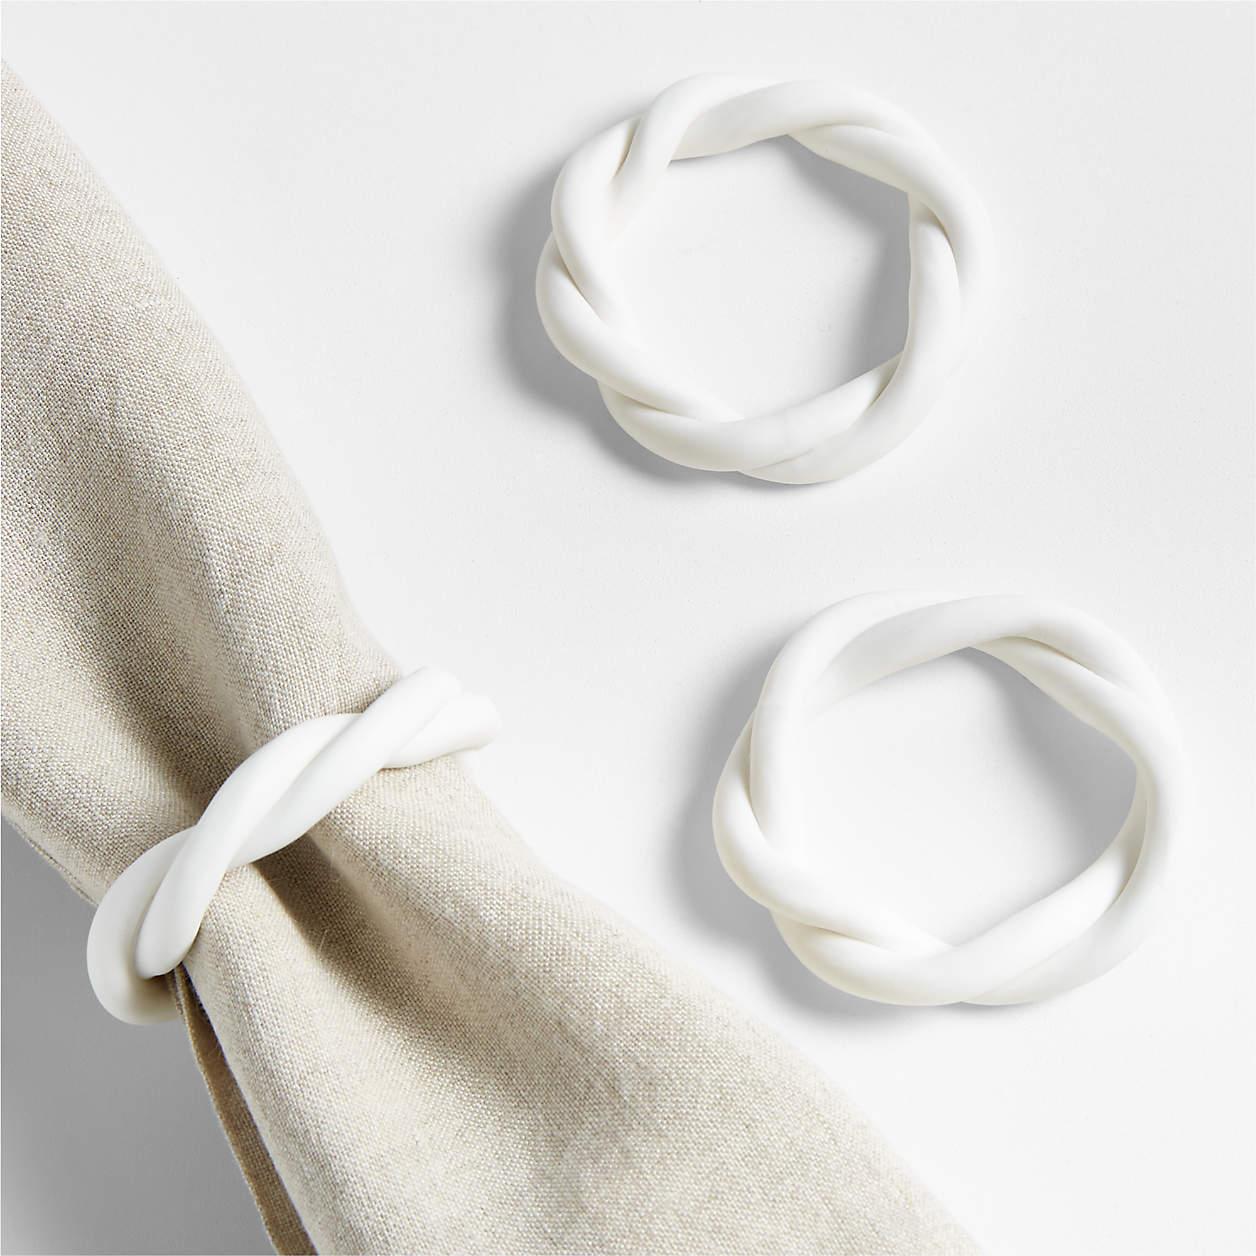 Woven napkin rings.